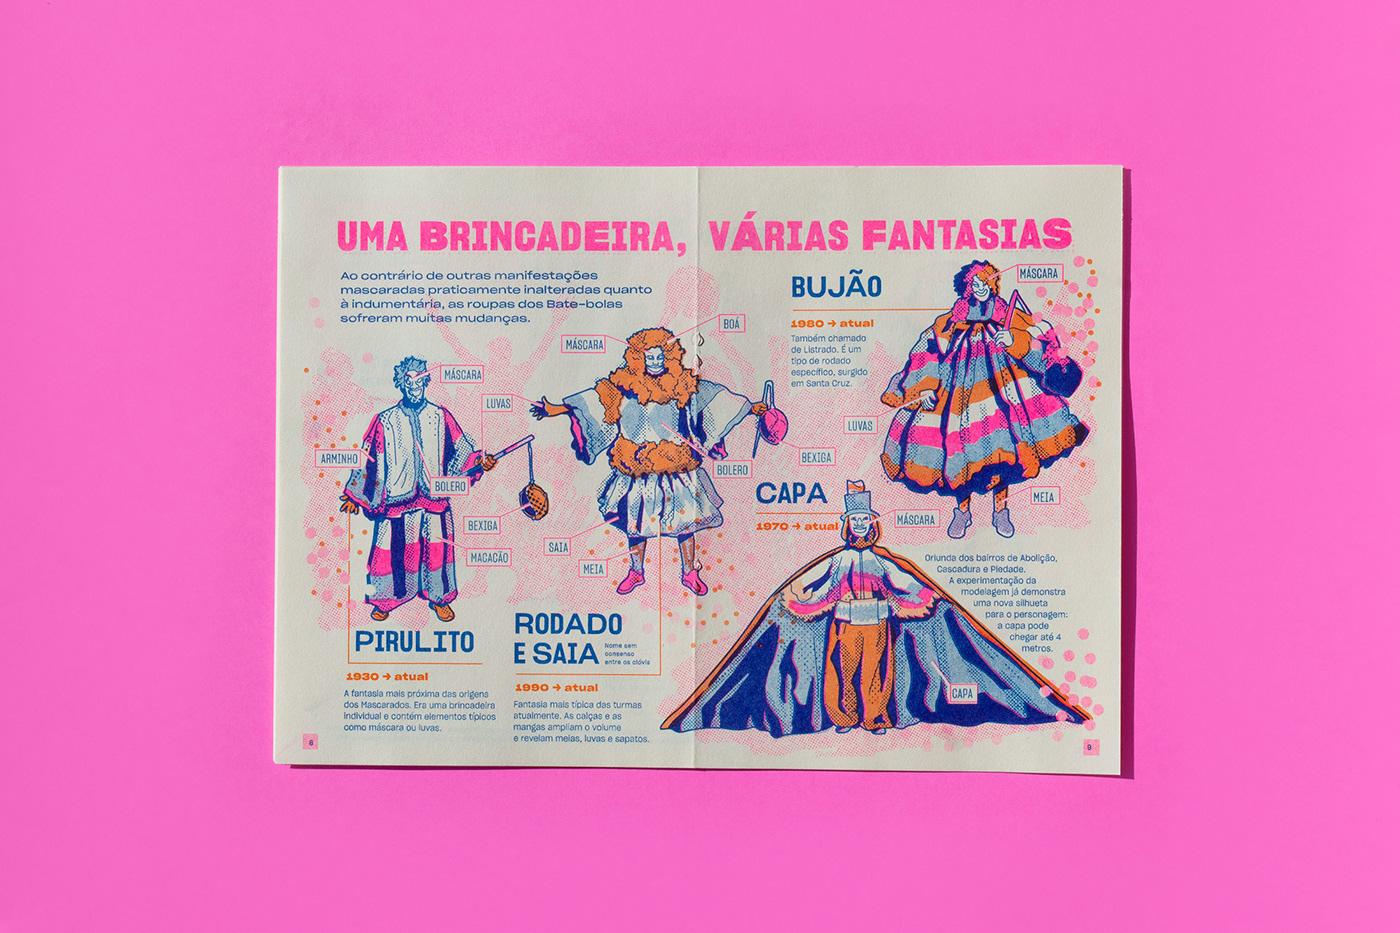 bate-bola Brasil Brazil carioca Carnaval Carnival Rio de Janeiro Riso risograph subúrbio